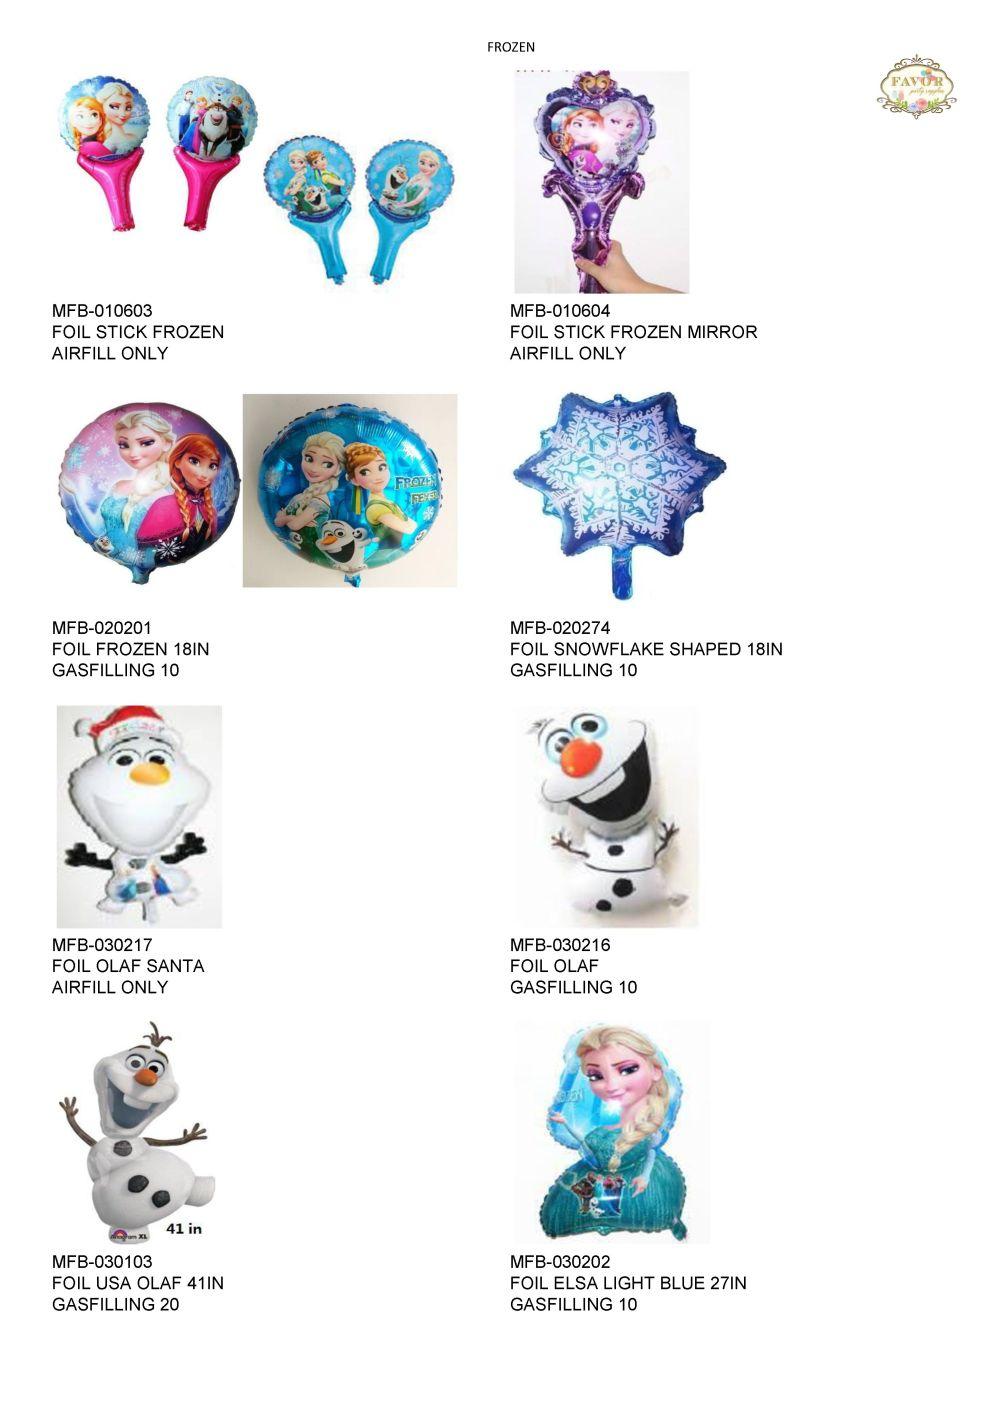 katalog-frozen_1